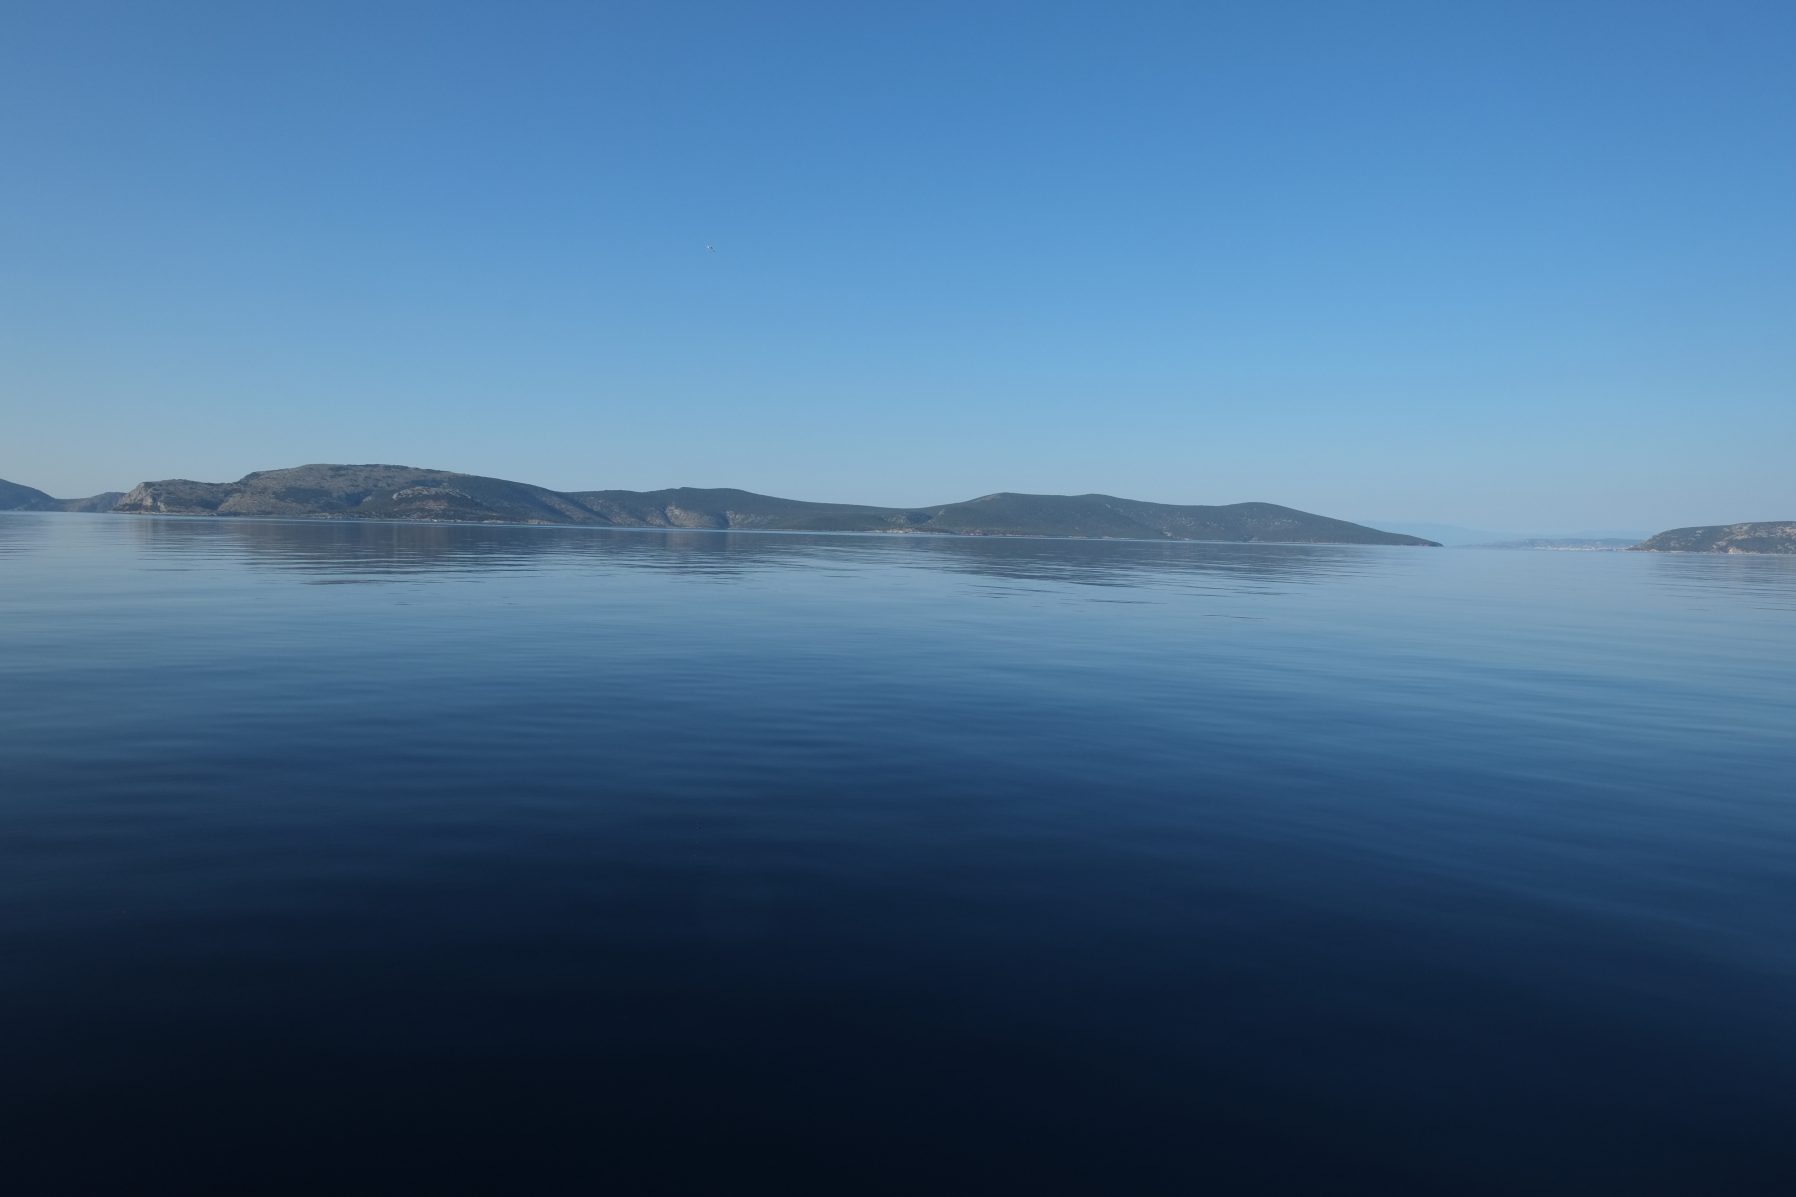 Les jolies îles grecques